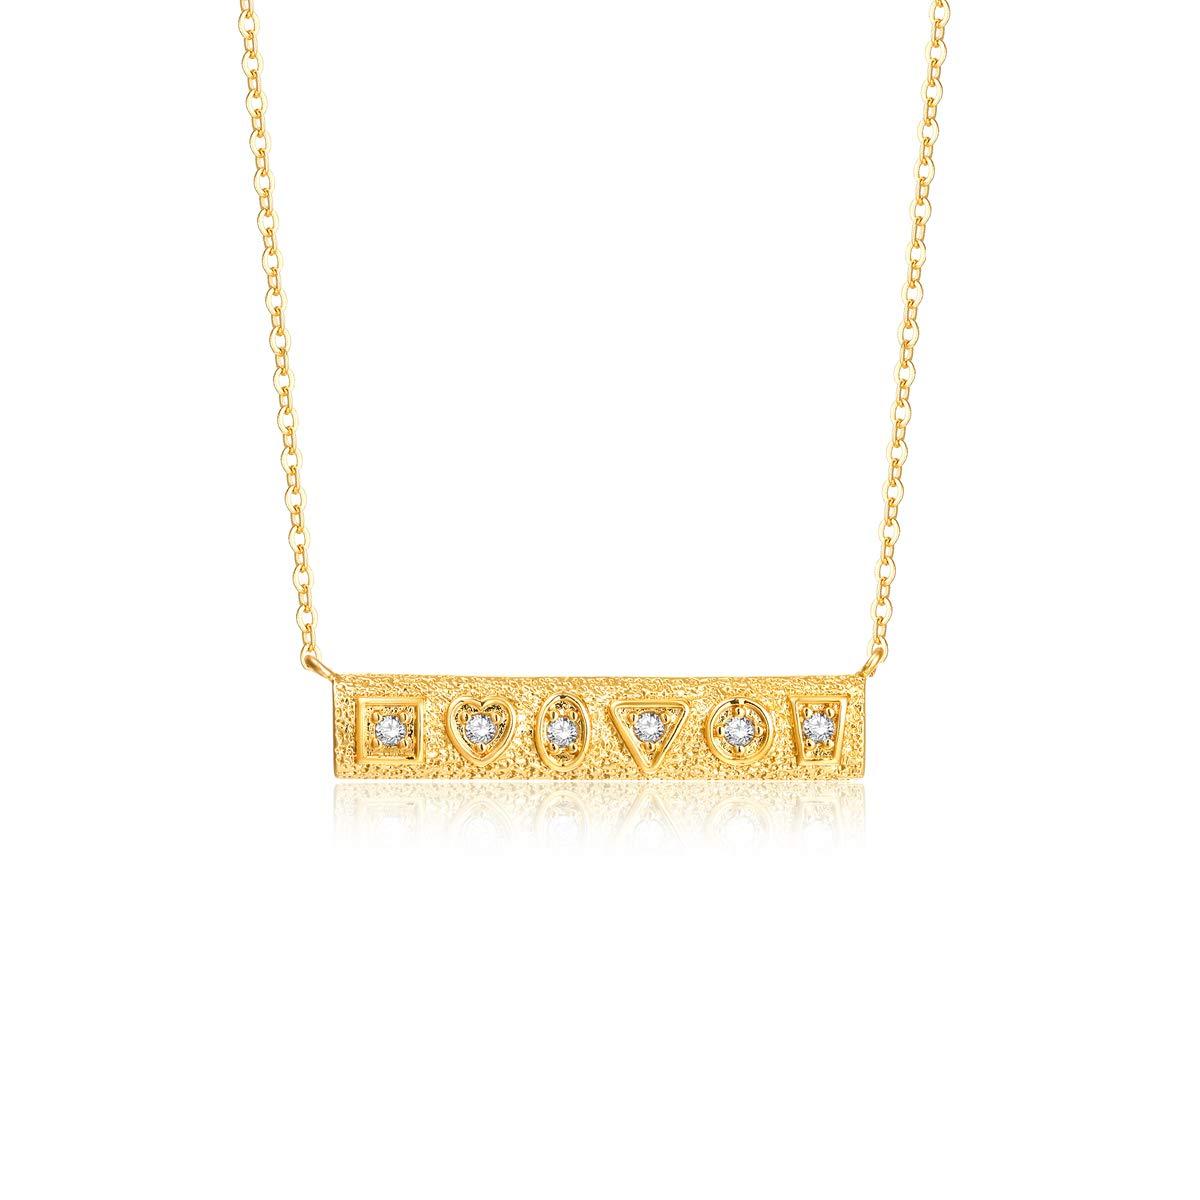 Mevecco Gold Bar Textured Geometric Bridesmaid Pendant Necklaces,18K Gold Filled Colorful Enamel Dainty Chain Horizontal Pendants CZ Necklaces for Women